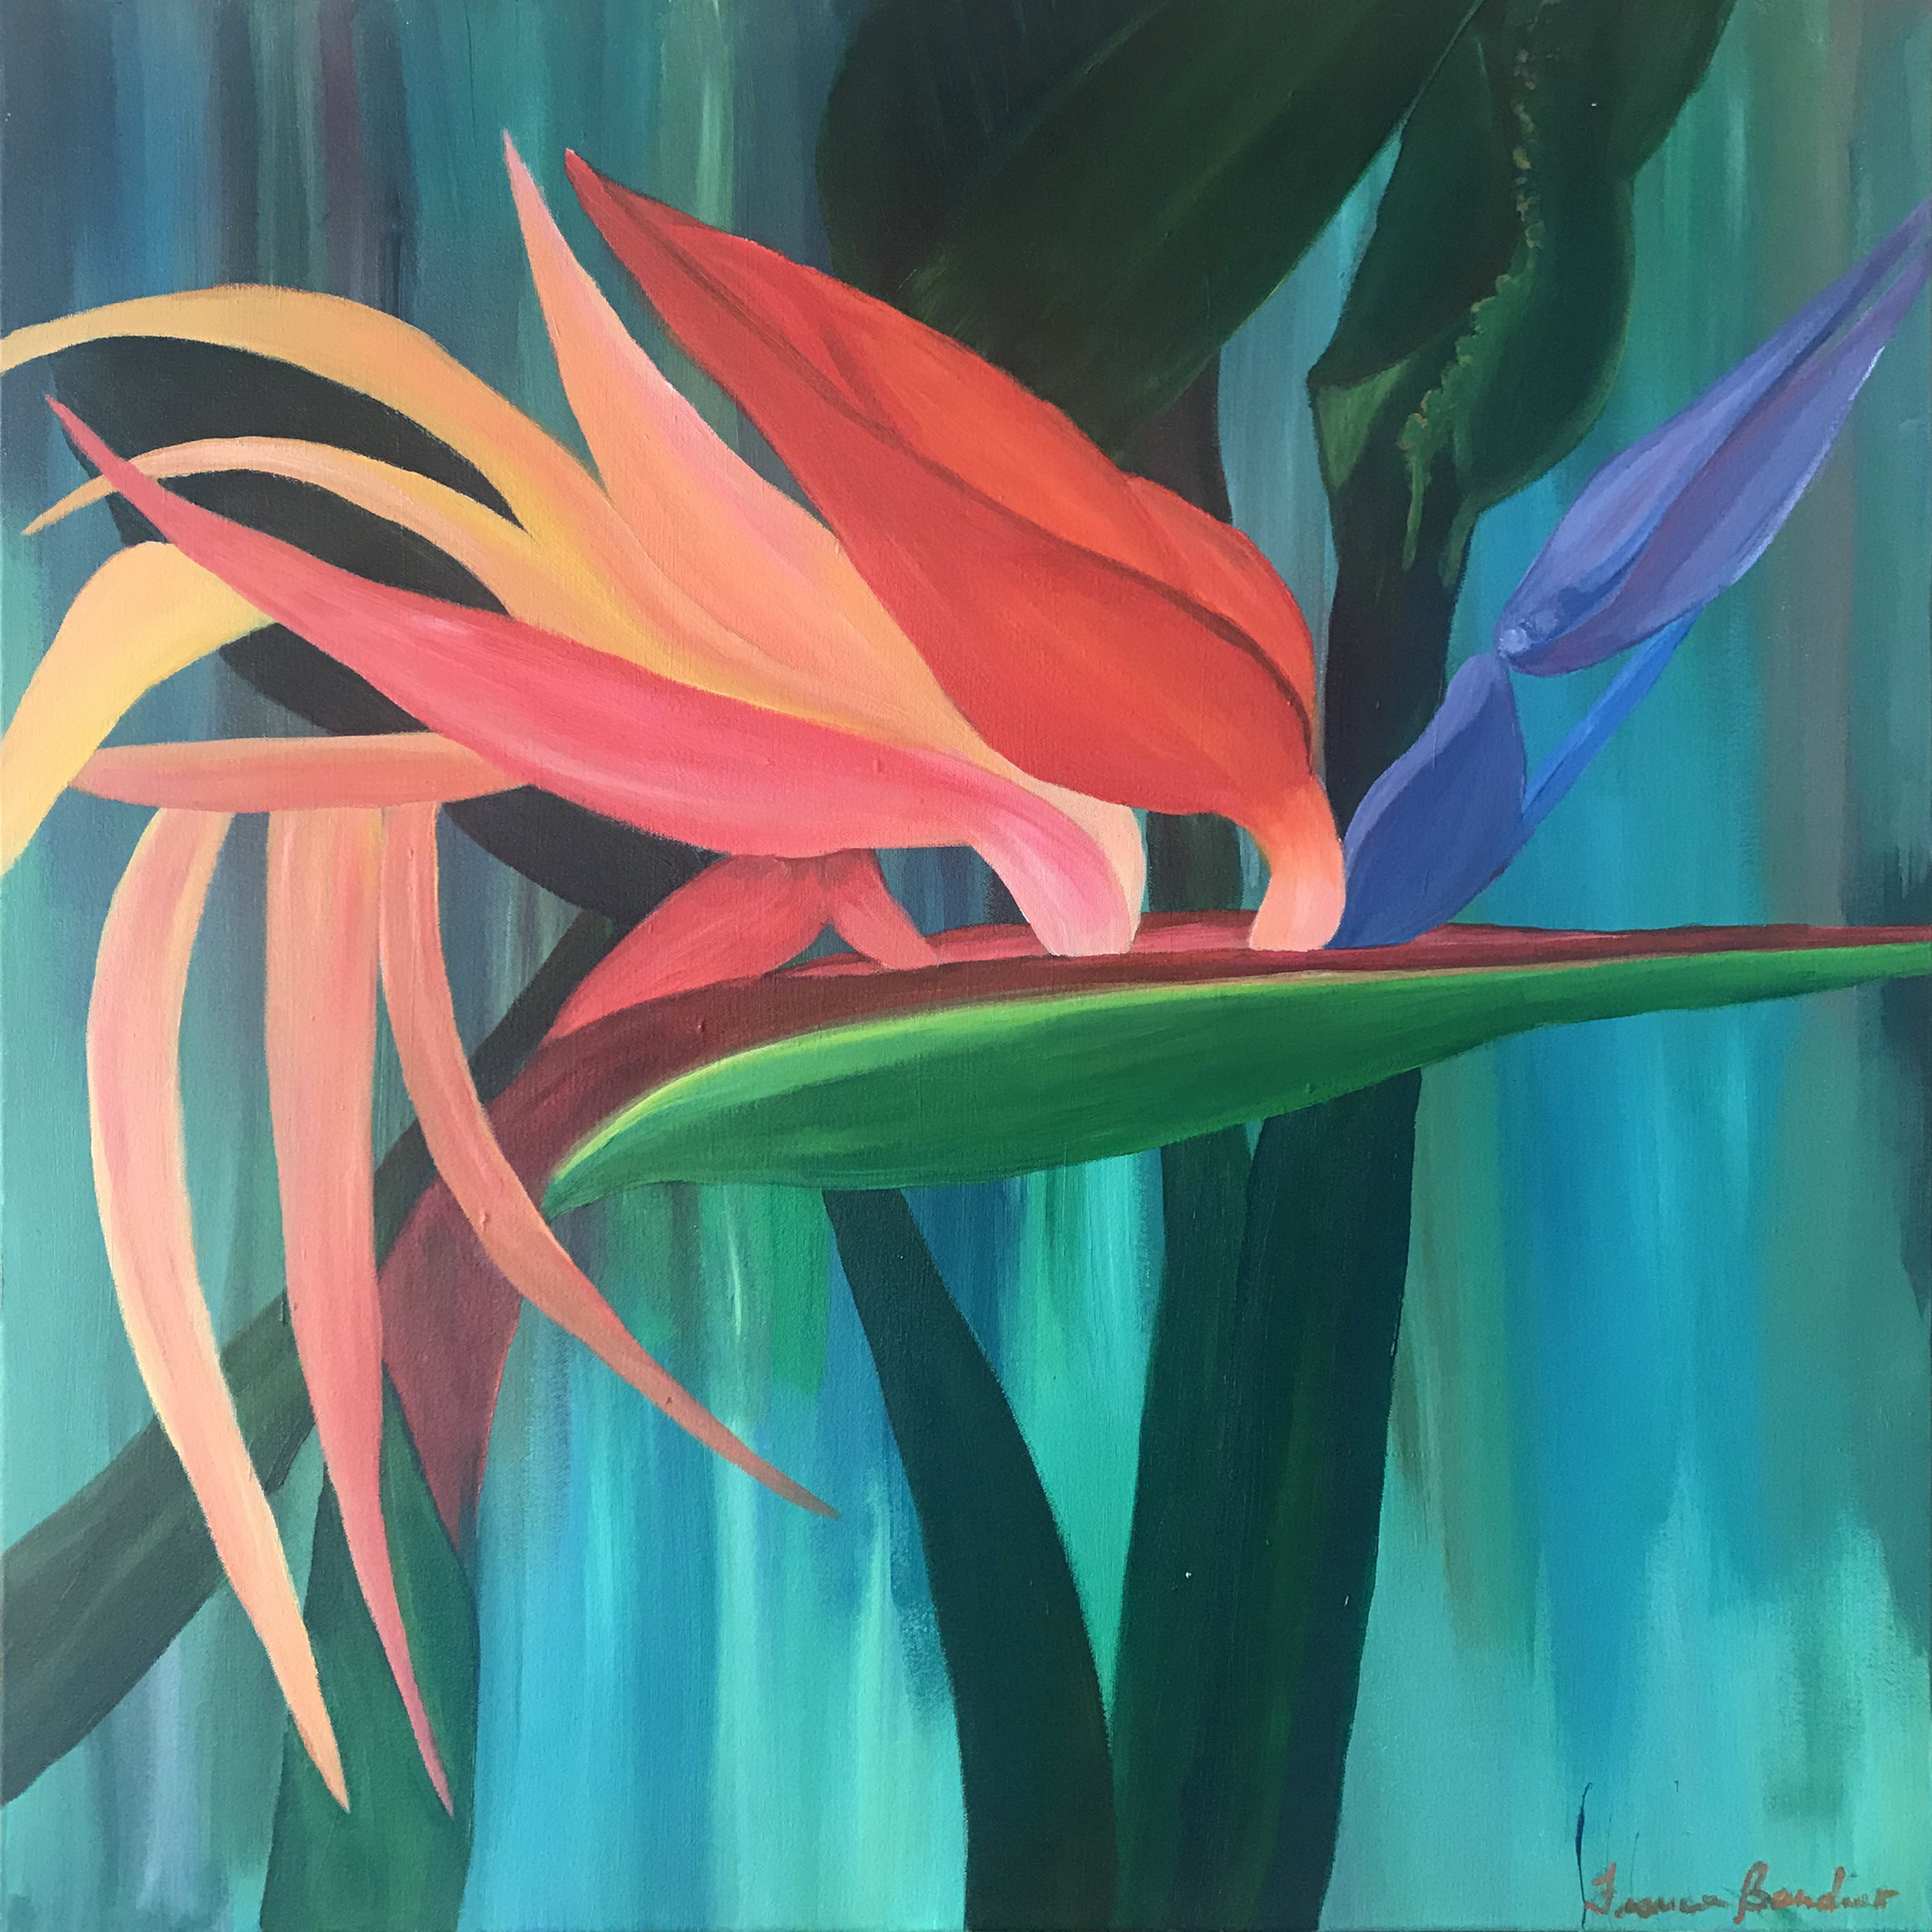 ©April2018, Francesca Bandino,  A Bright Soul . Acrylic on Canvas, 24x24x.8 inches